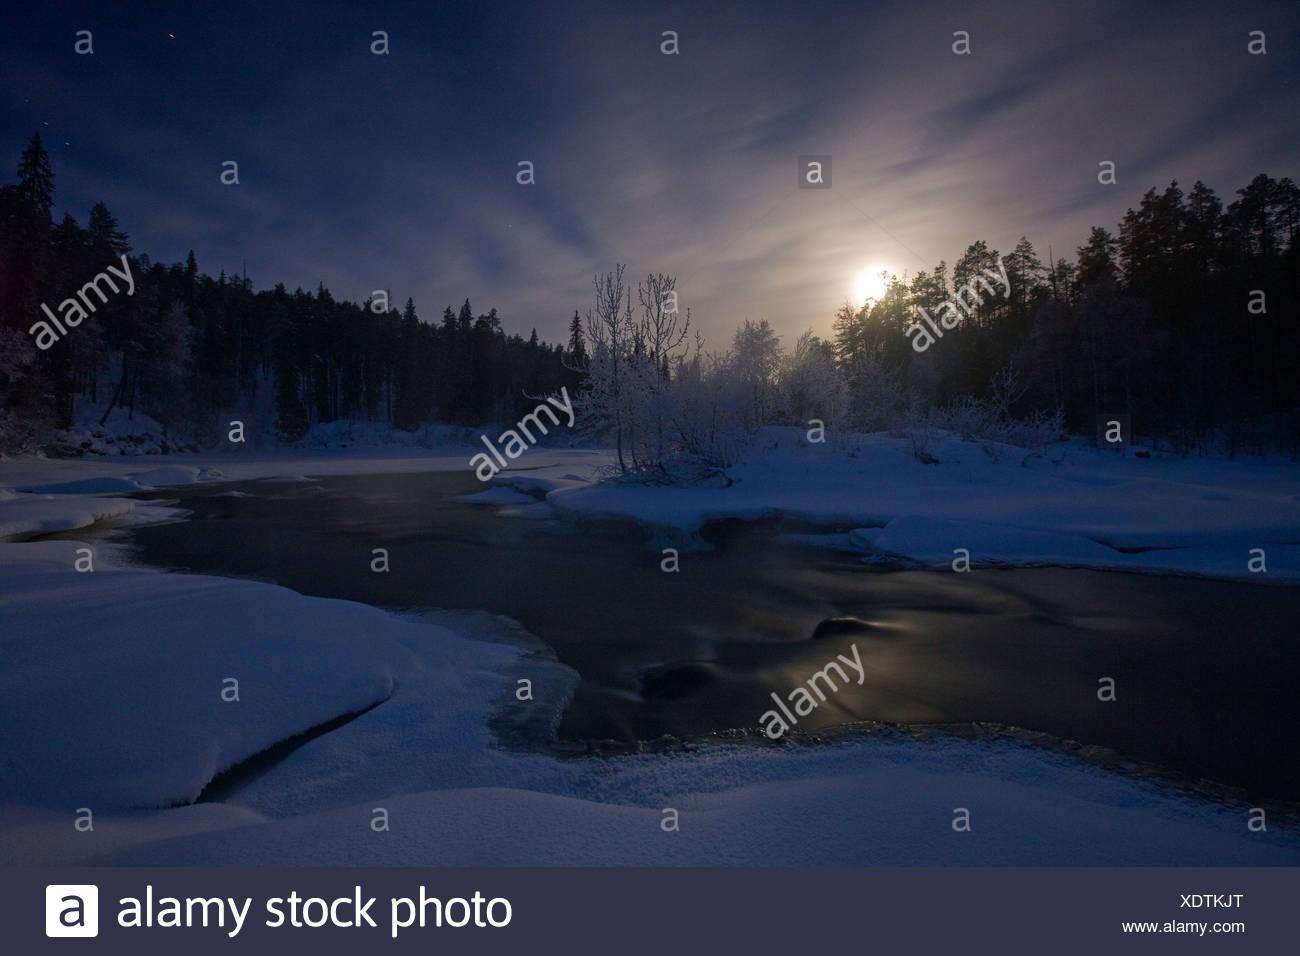 Luna en la Oulanka River en el Parque Nacional de Oulanka, Finlandia. Imagen De Stock